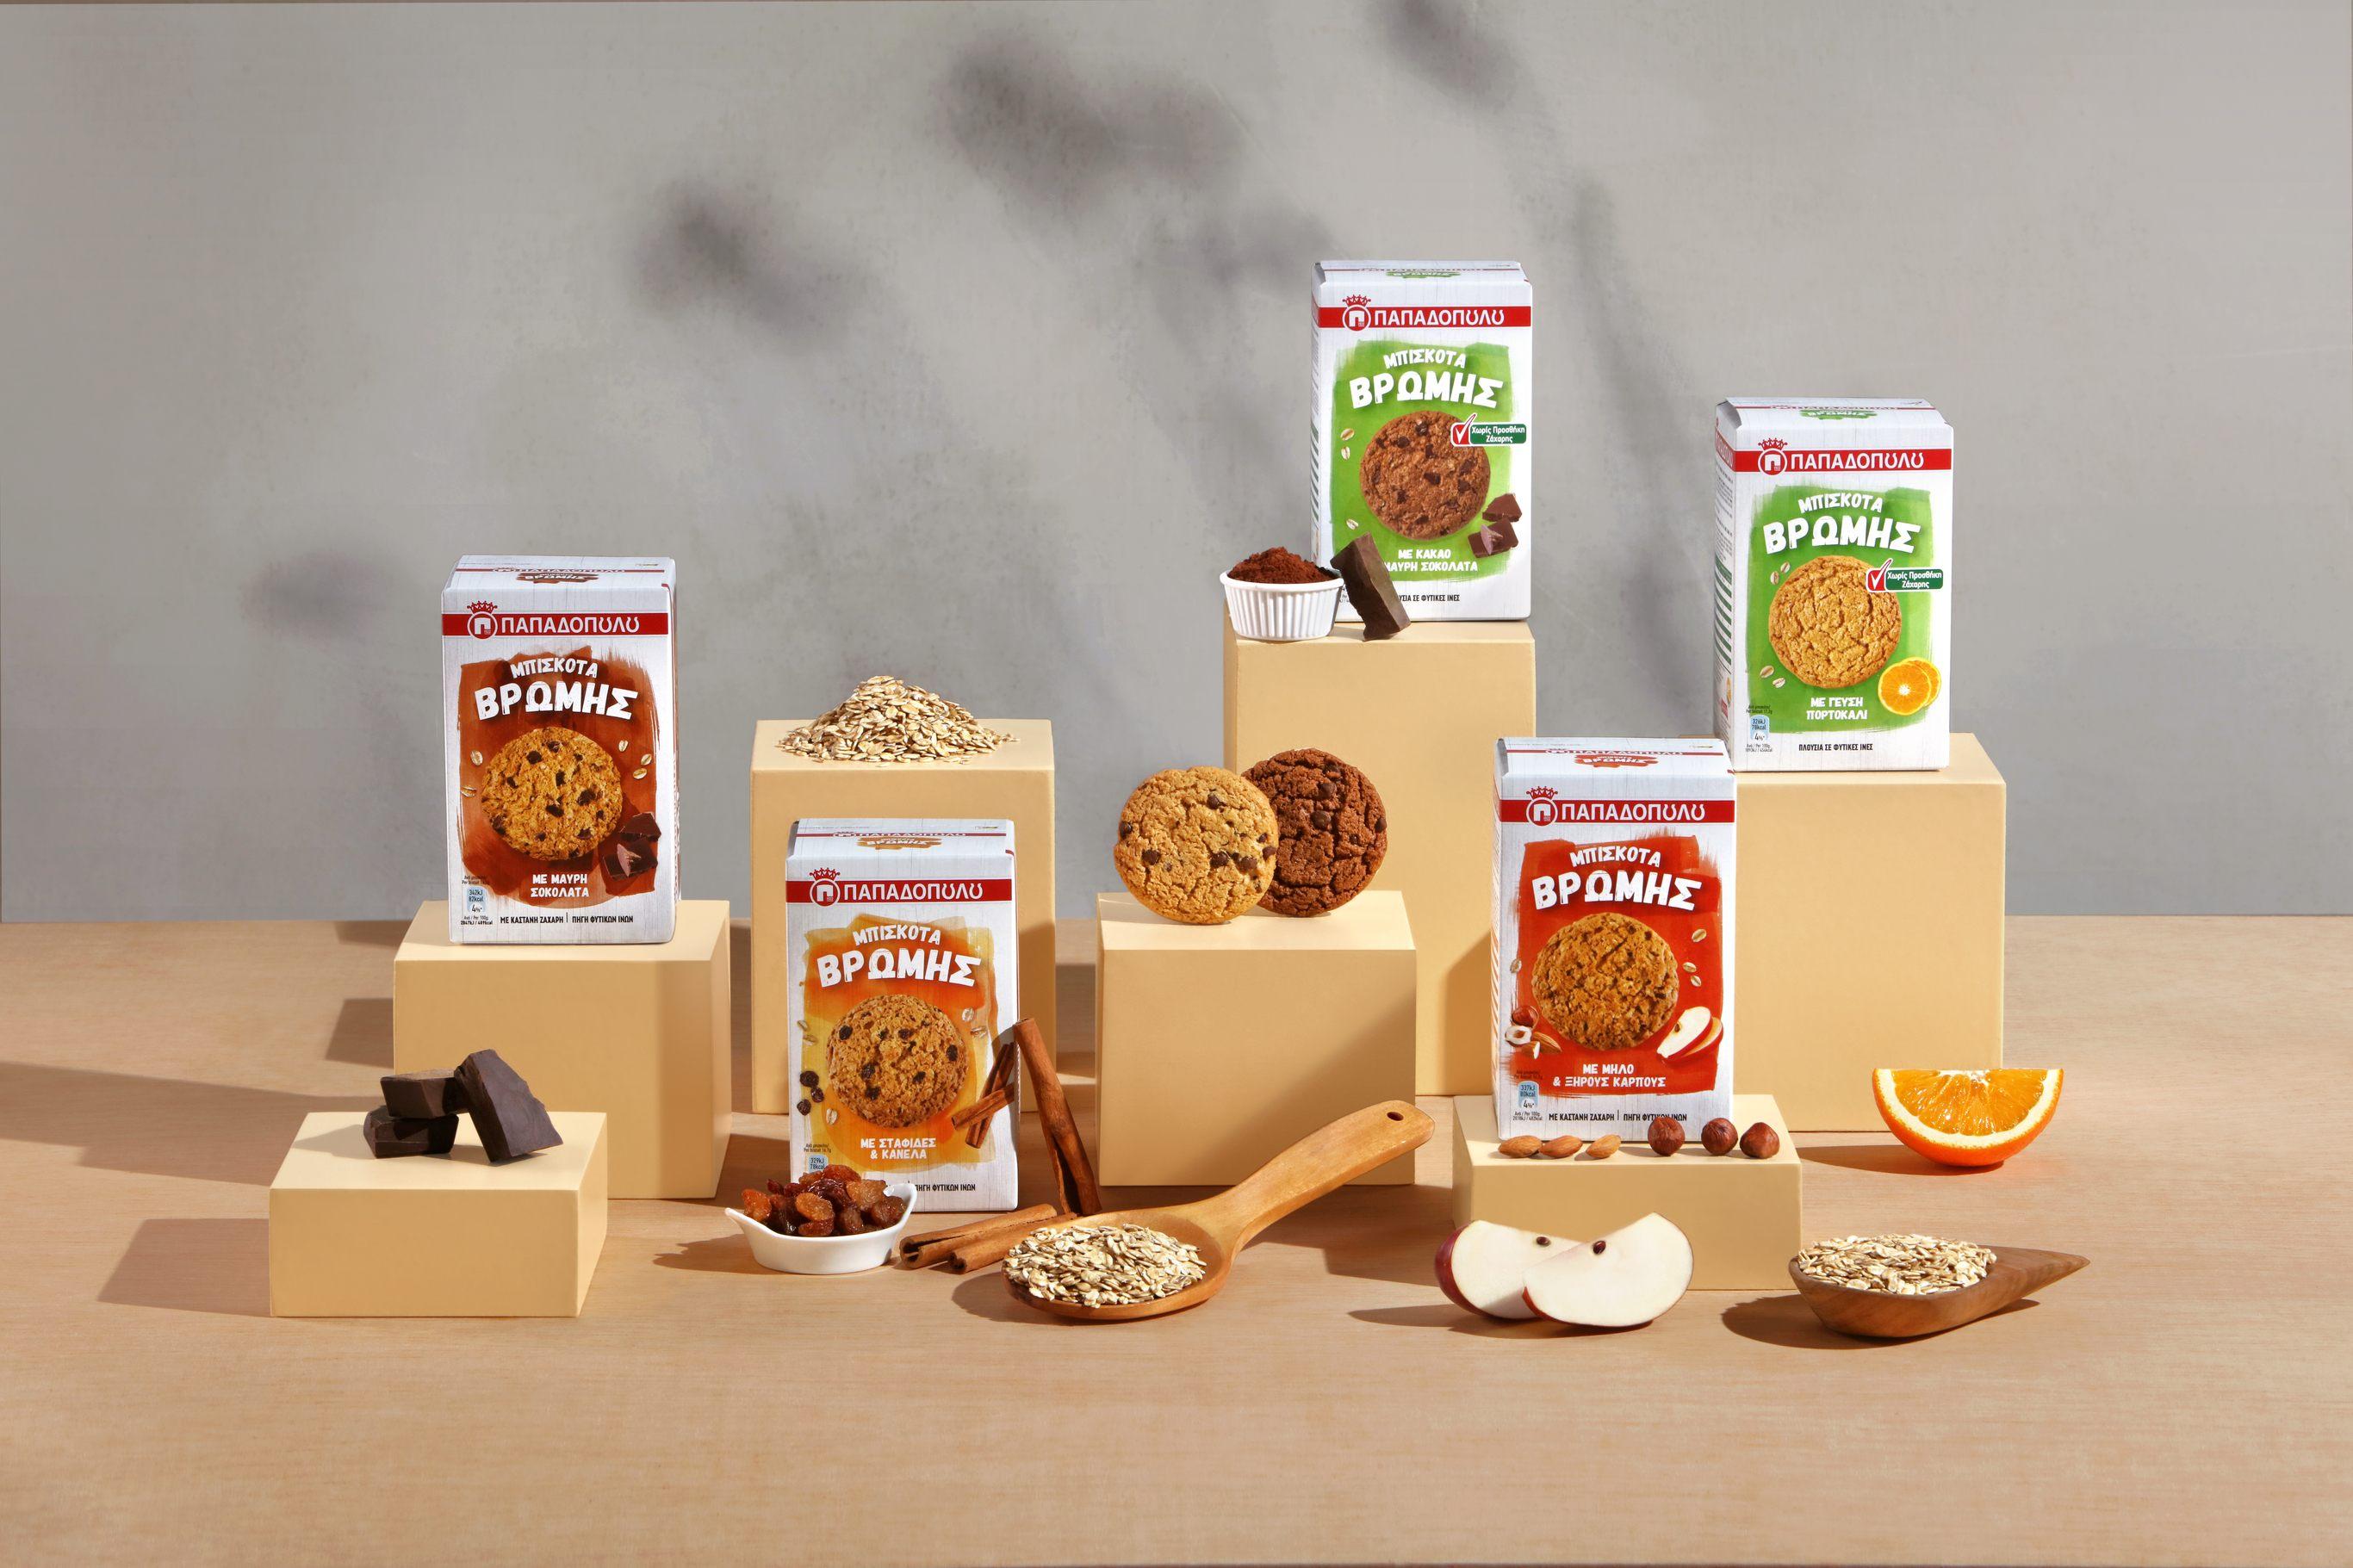 image for Θέλεις ένα θρεπτικό σνακ; Δοκίμασε μπισκότα βρώμης!